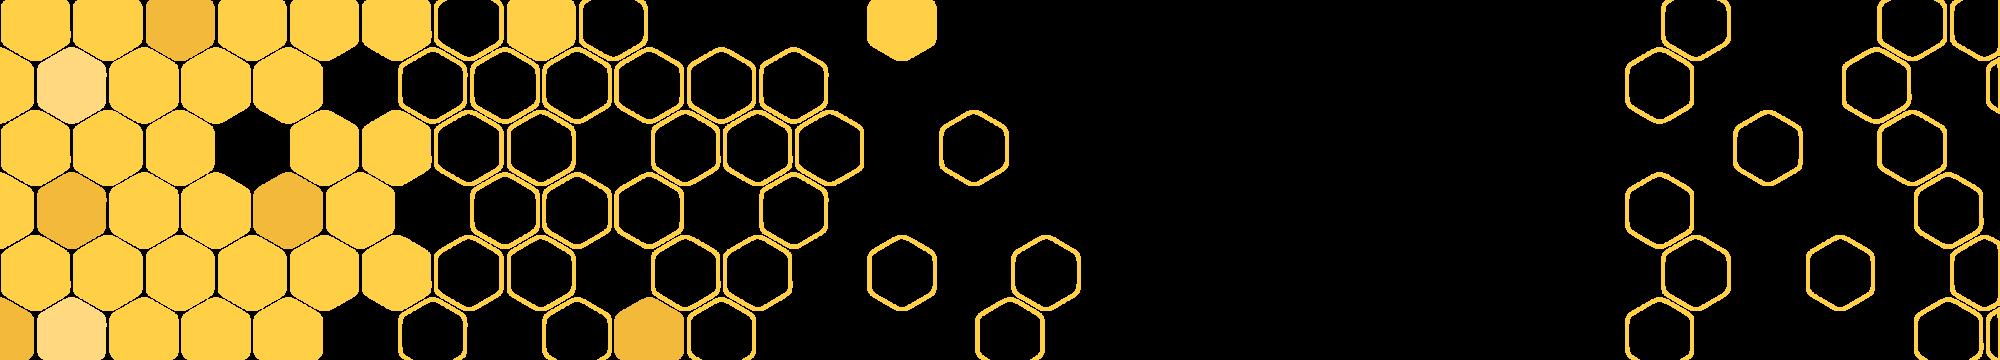 Durham County Beekeepers